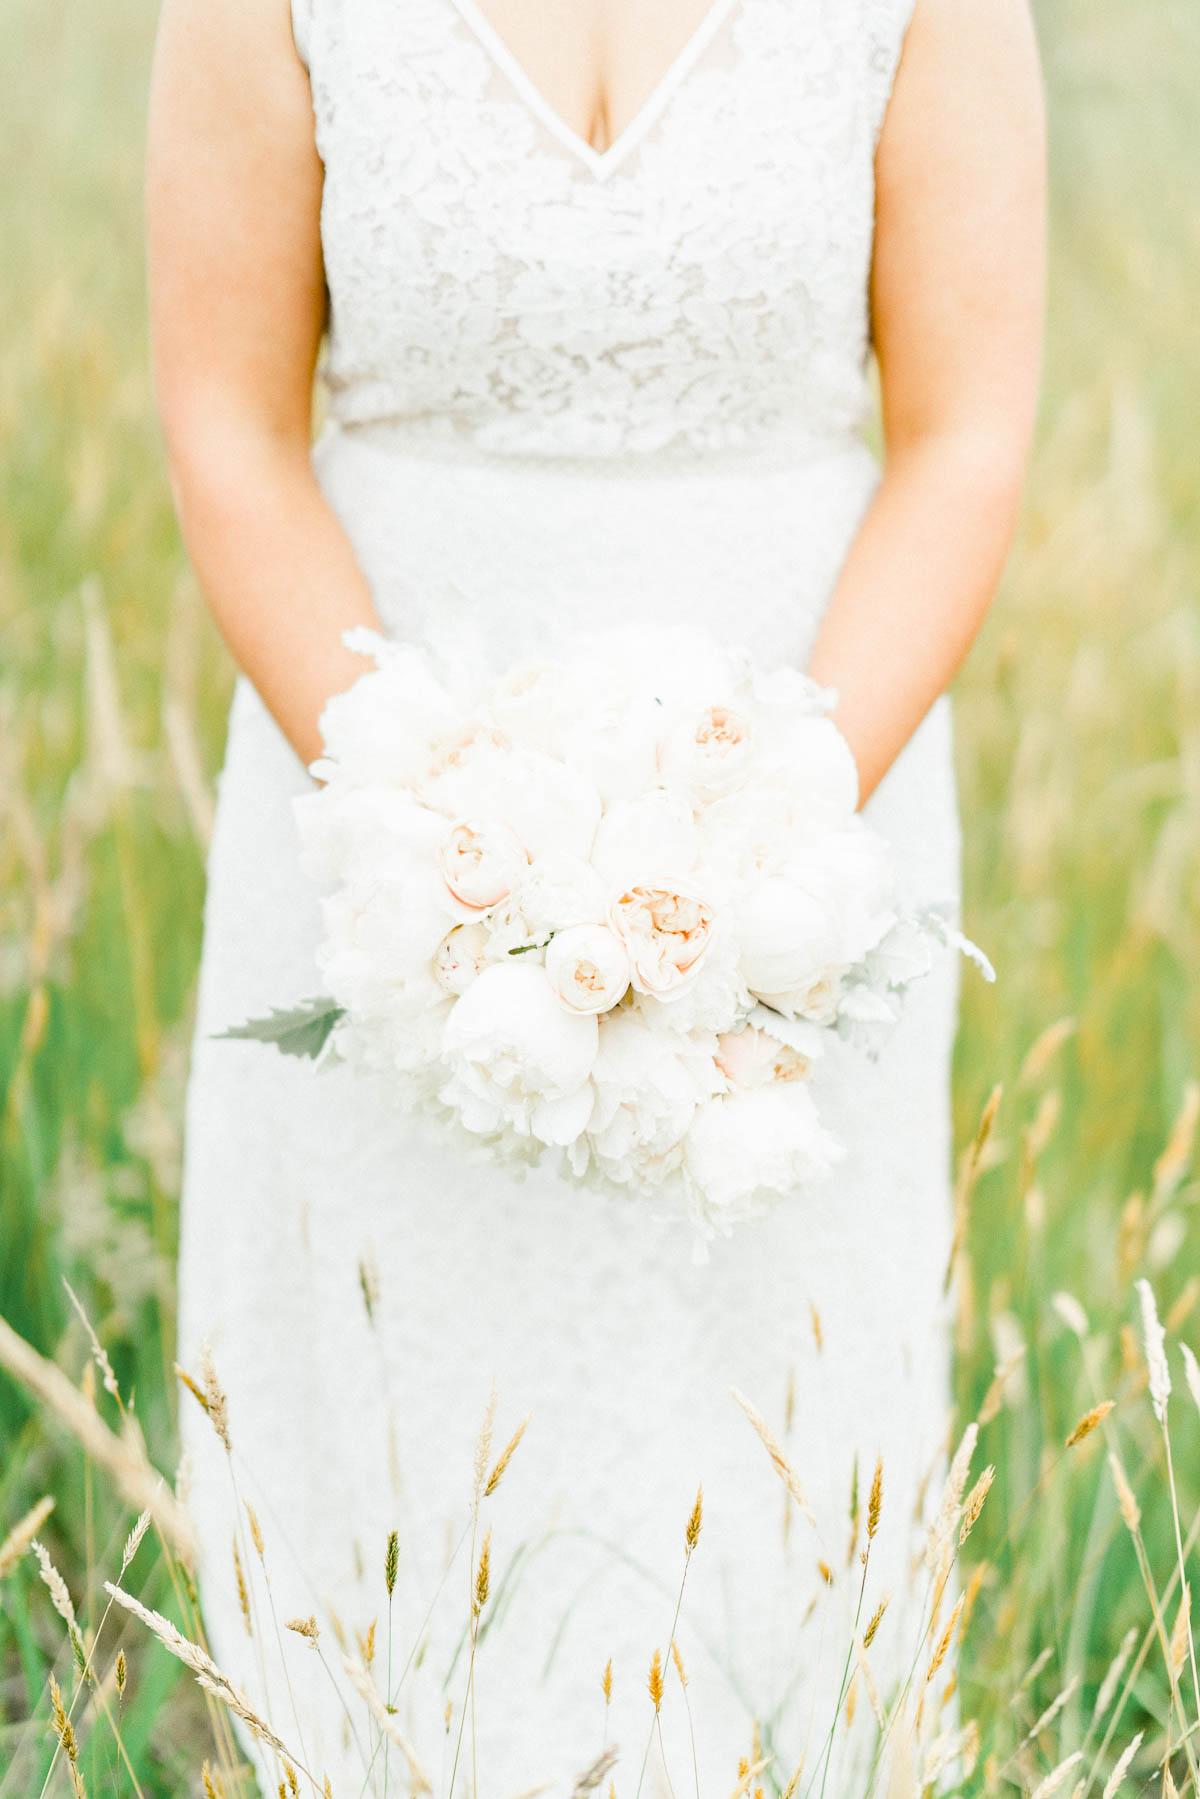 trenavin-chapel-phillip-island-wedding-heart+soul-weddings-sally-sean-01707.jpg